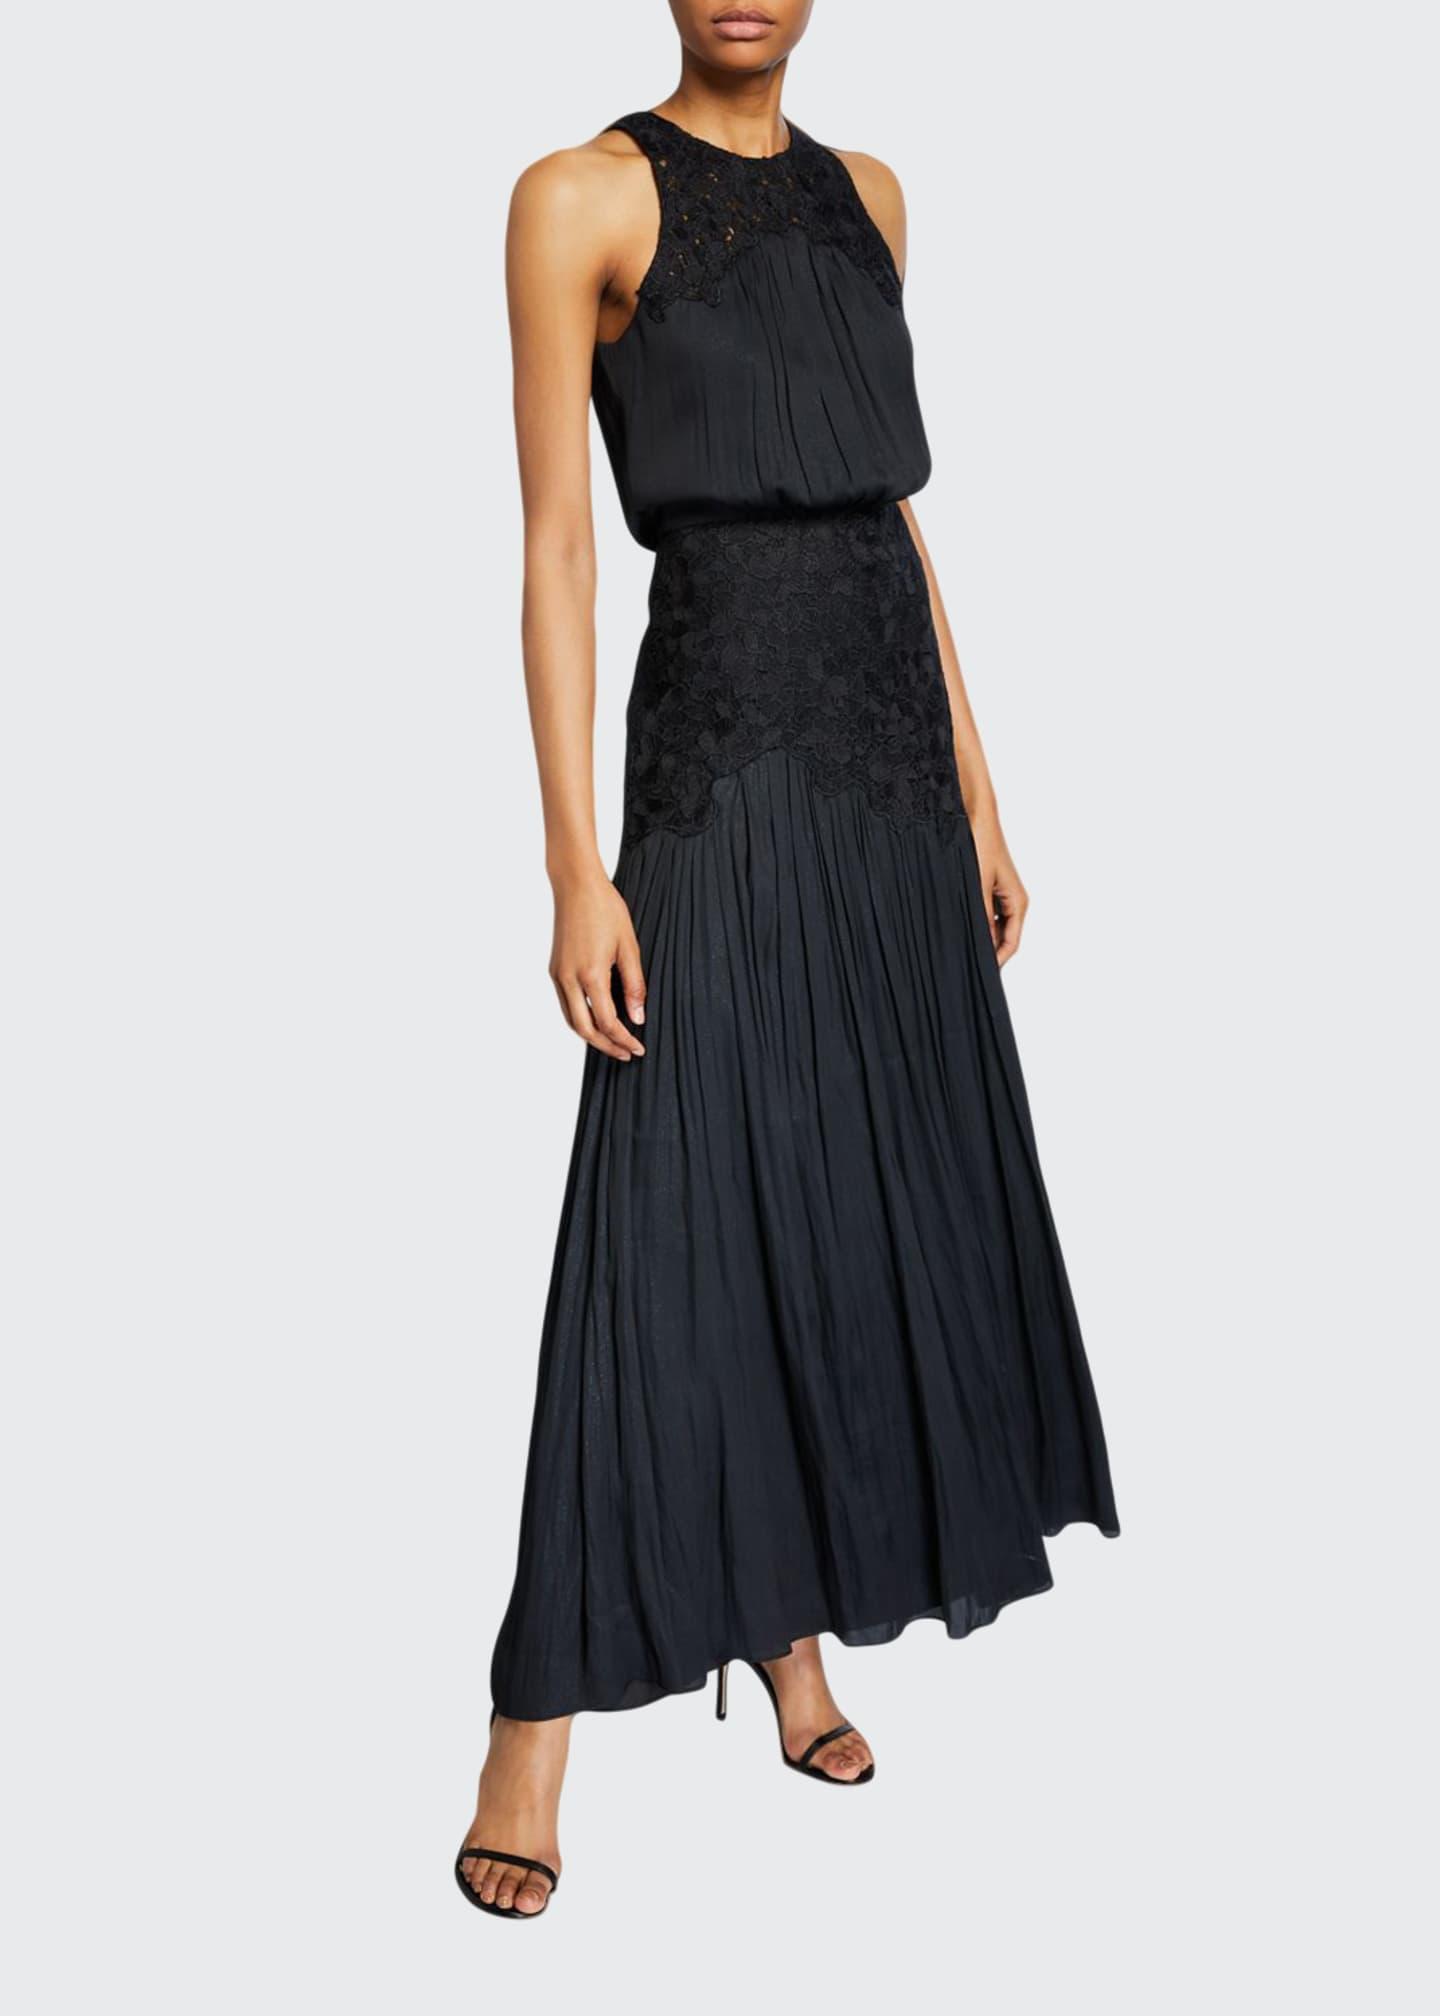 Halston Metallic Memory Georgette Floral Applique Sleeveless Gown